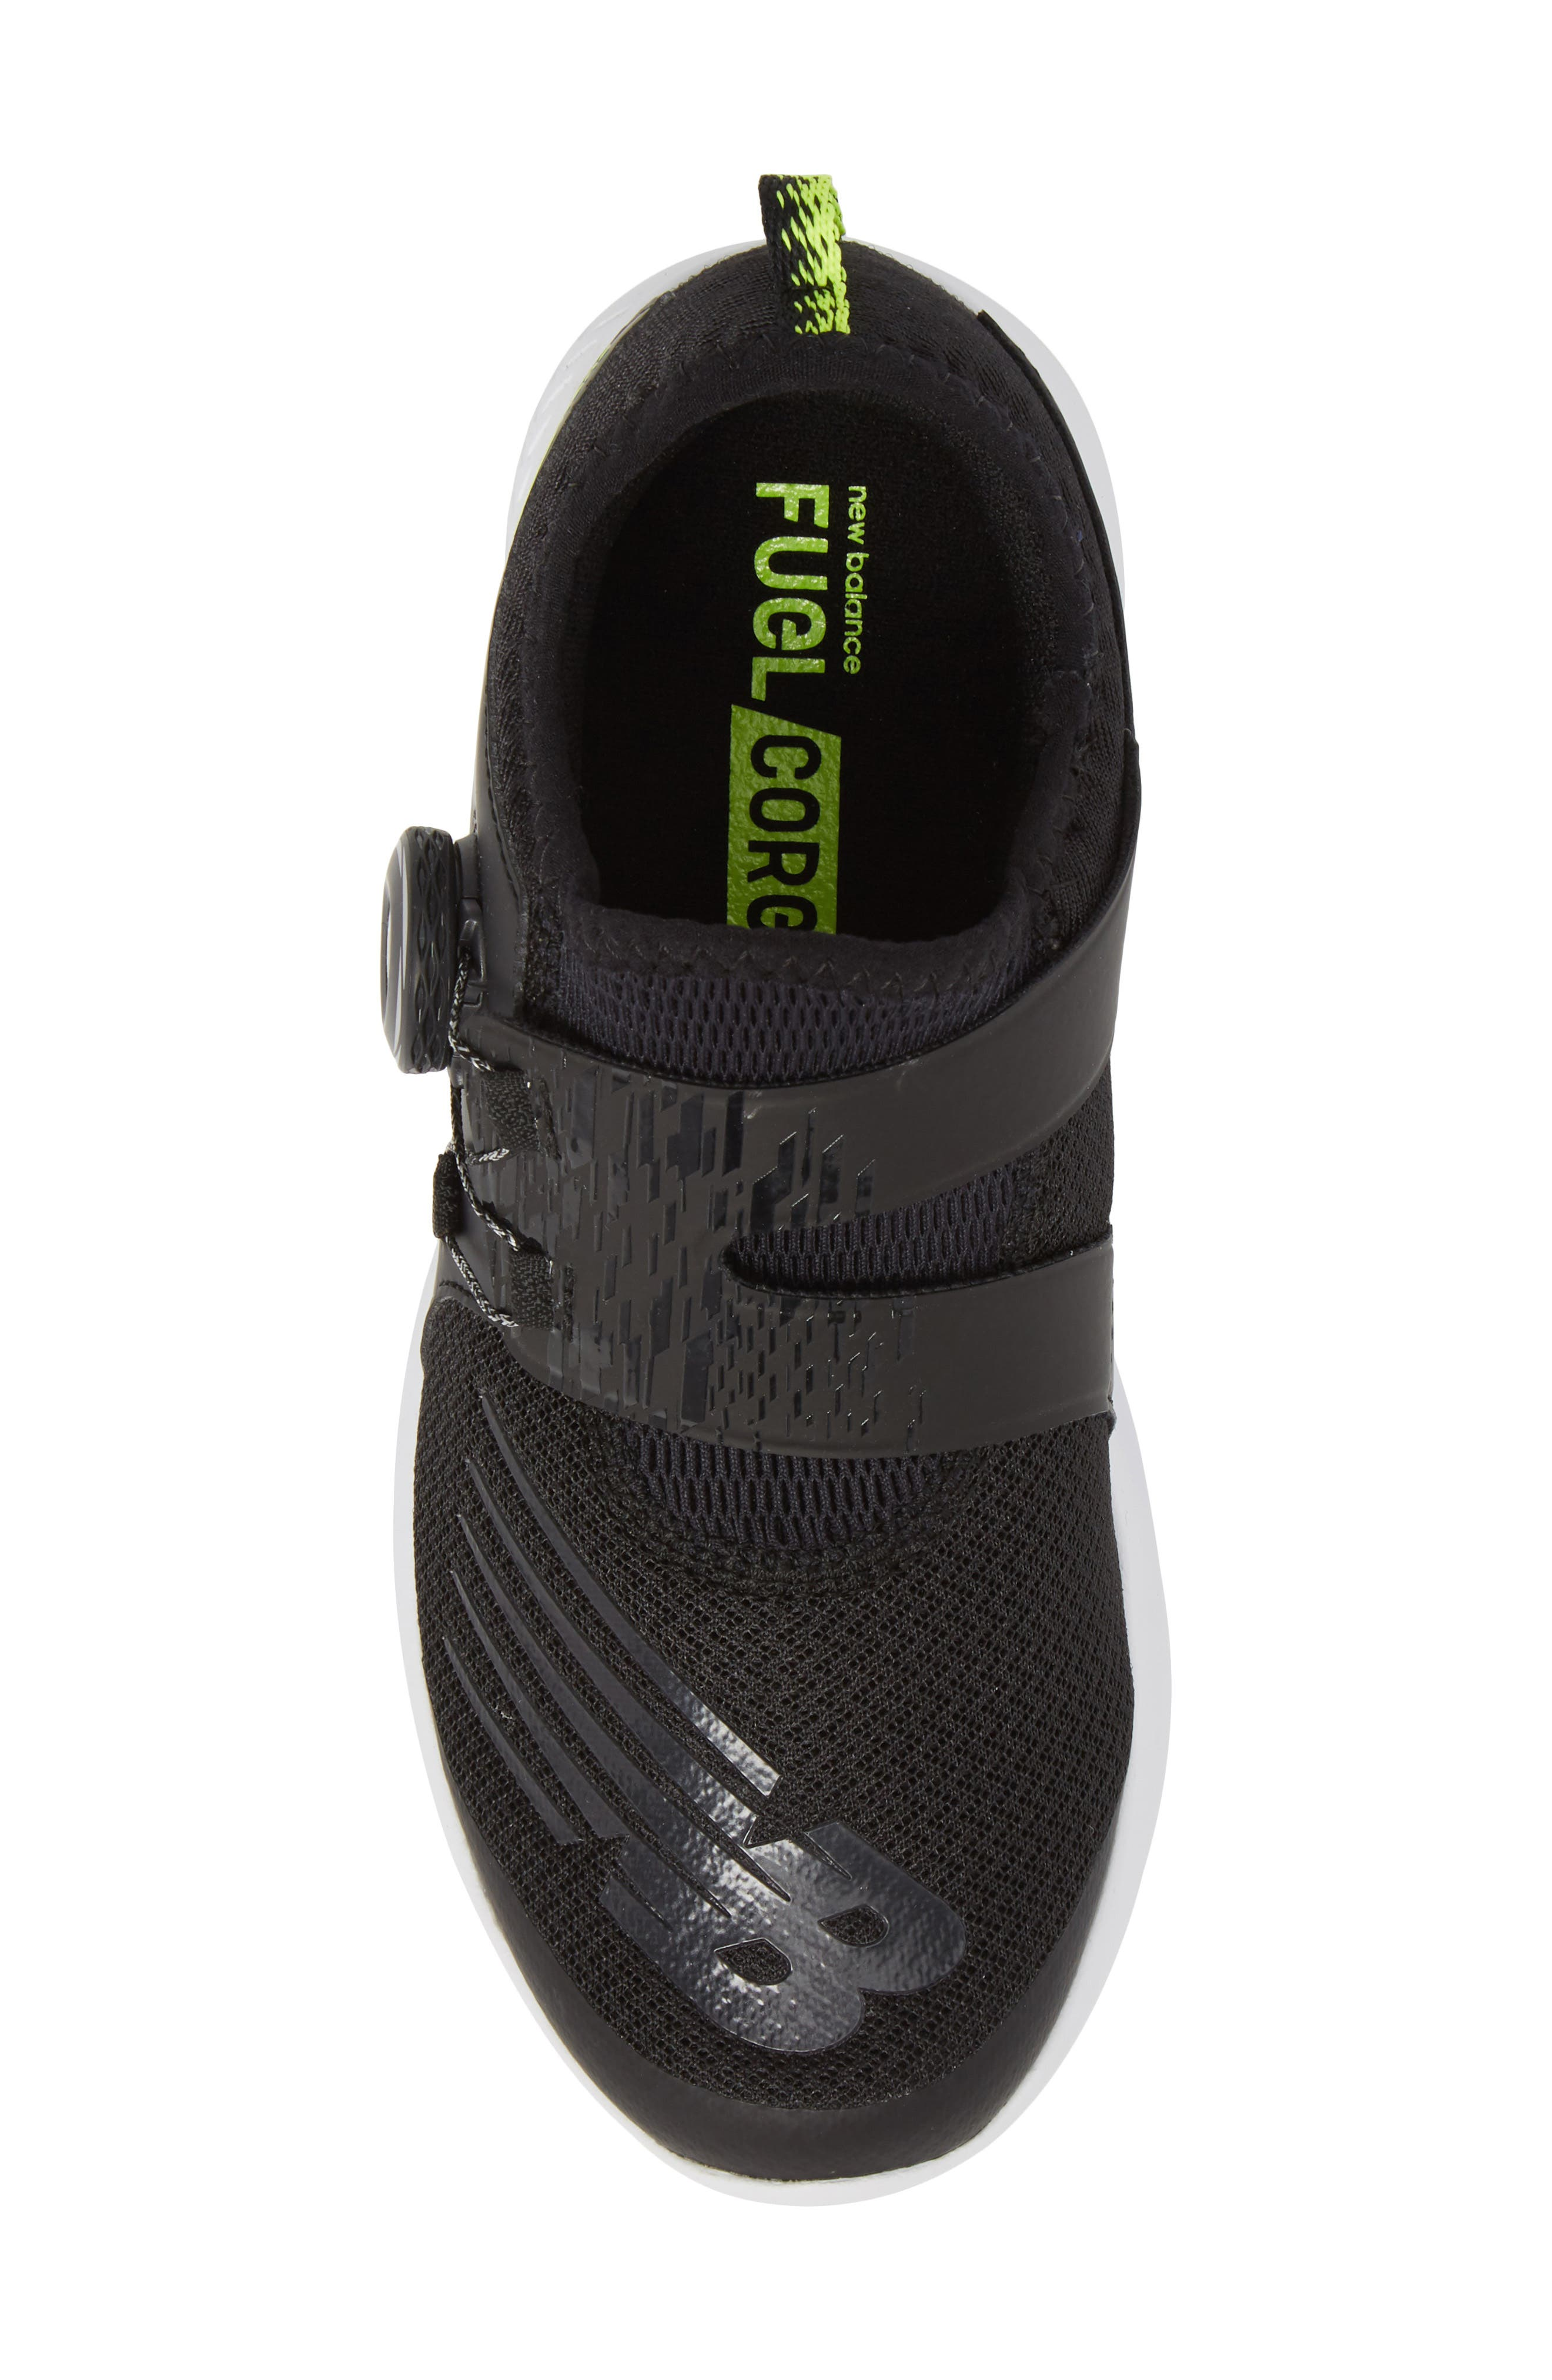 BKO Running Shoe,                             Alternate thumbnail 5, color,                             Black/ Hi Lite